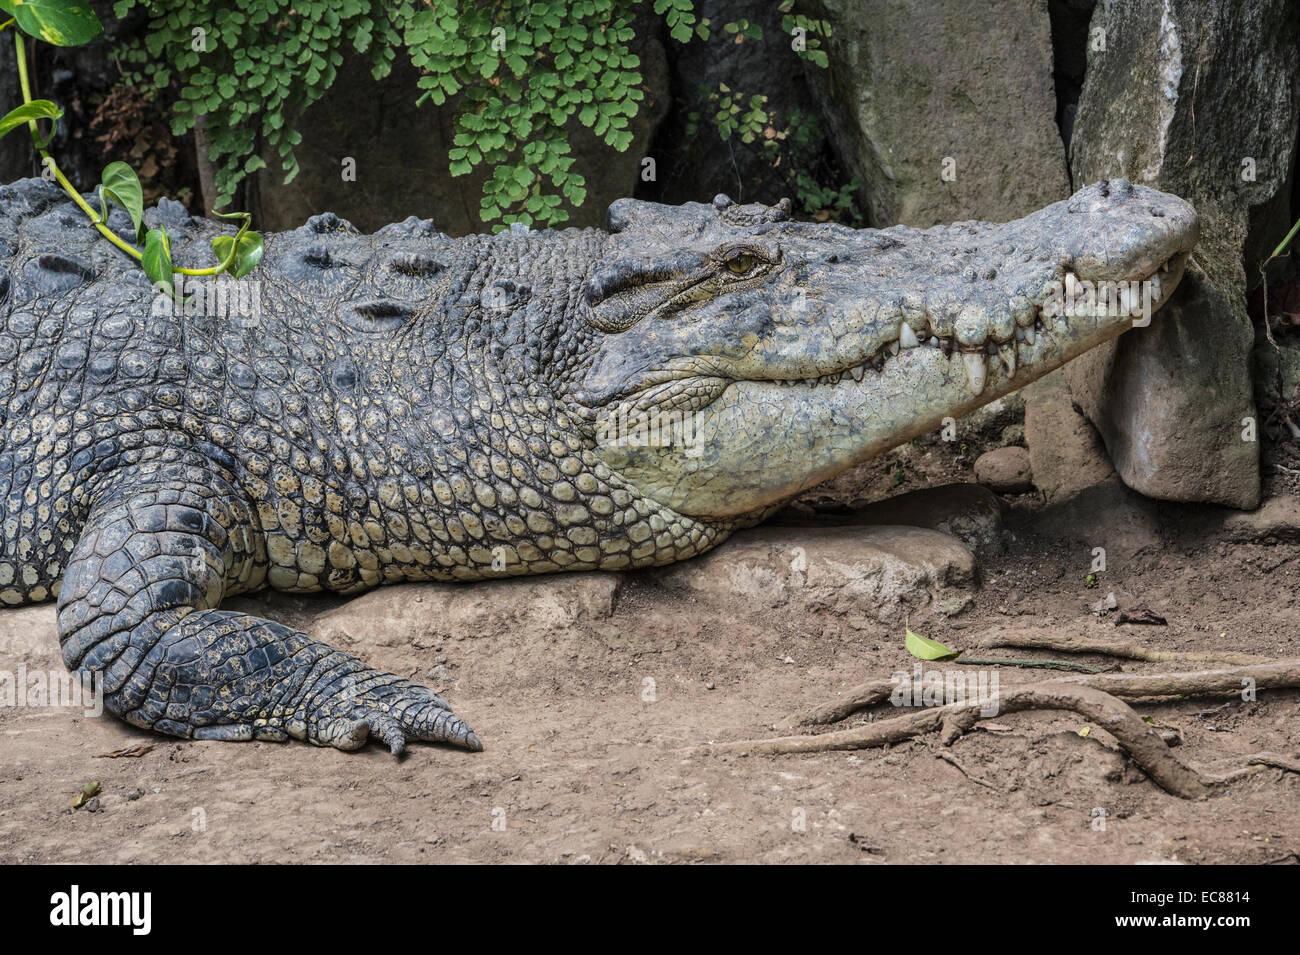 Saltwater Crocodile (Crocodylus porosus), Bali Reptile Park, Indonesia - Stock Image